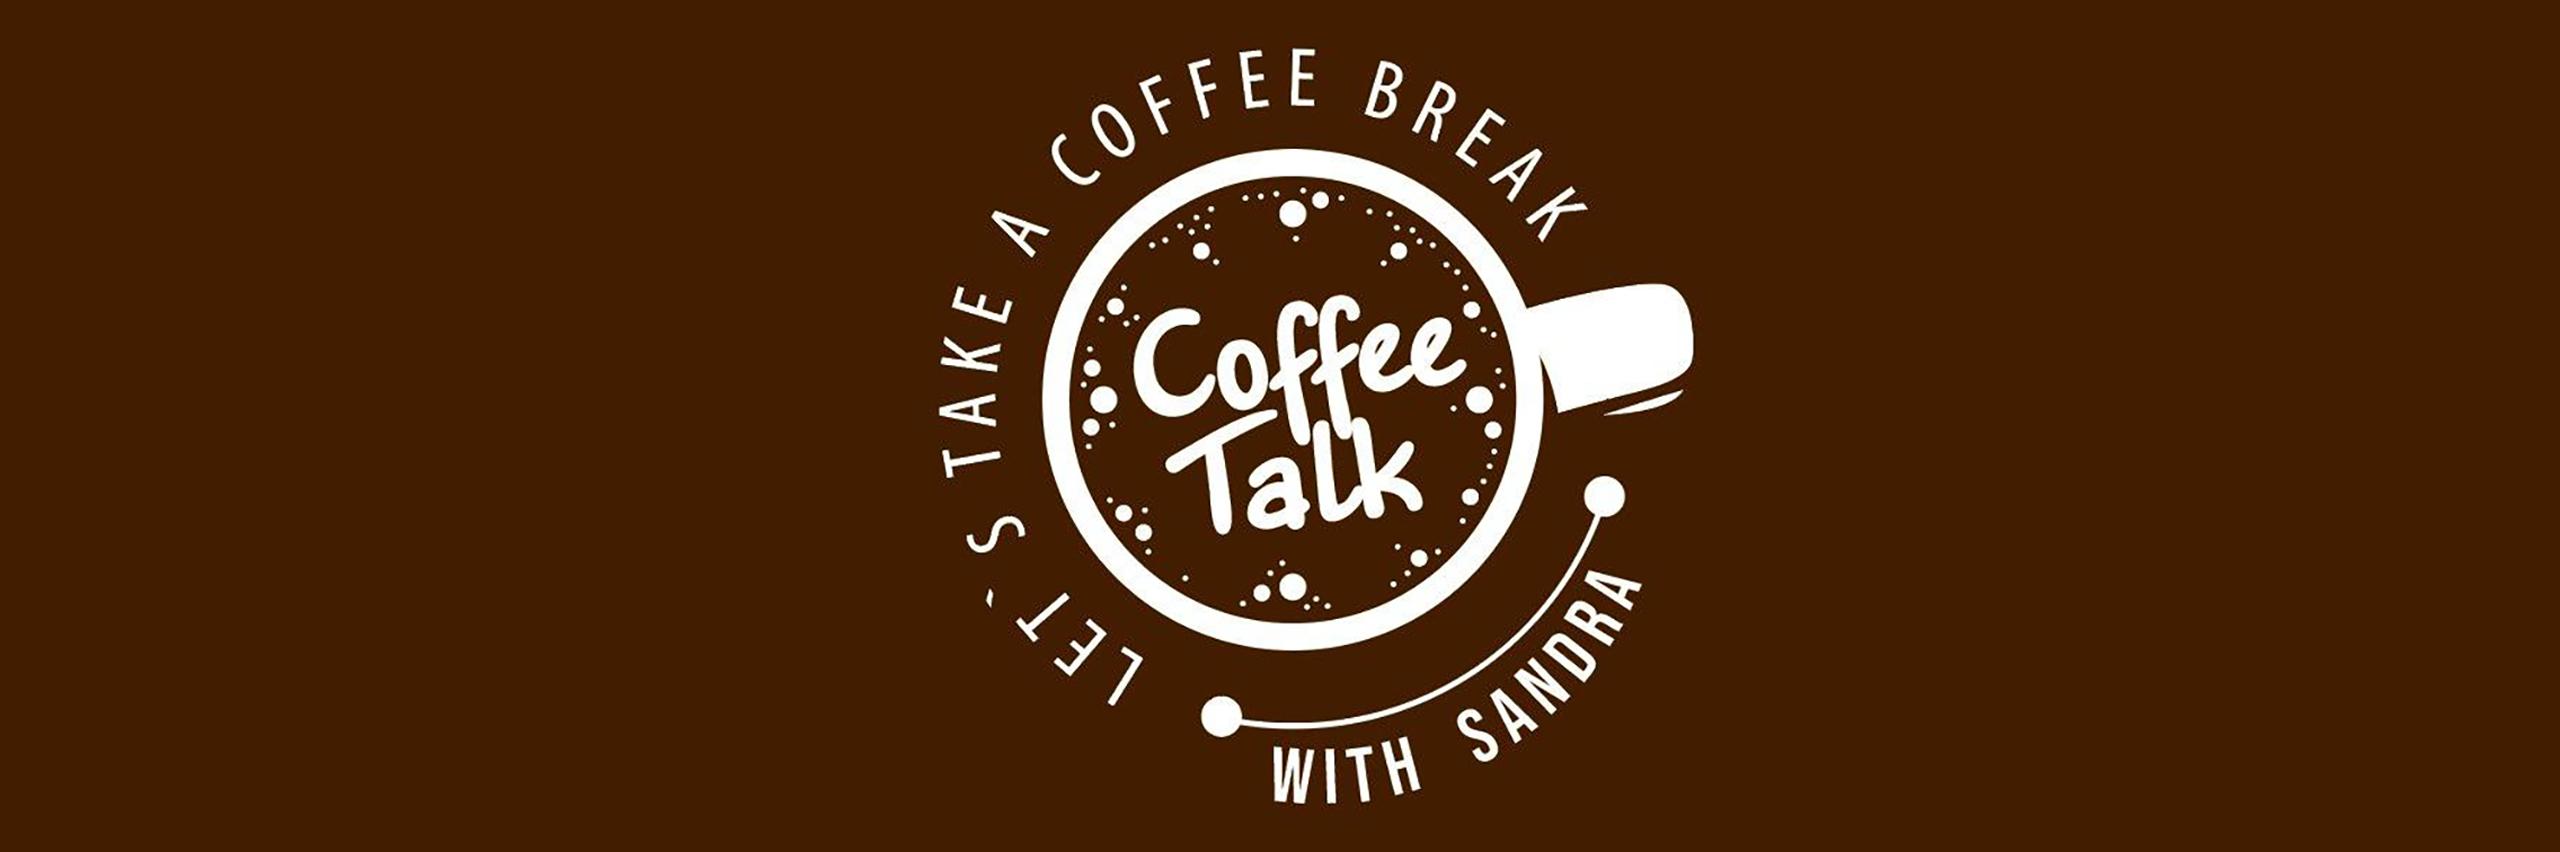 coffee_talk_header2